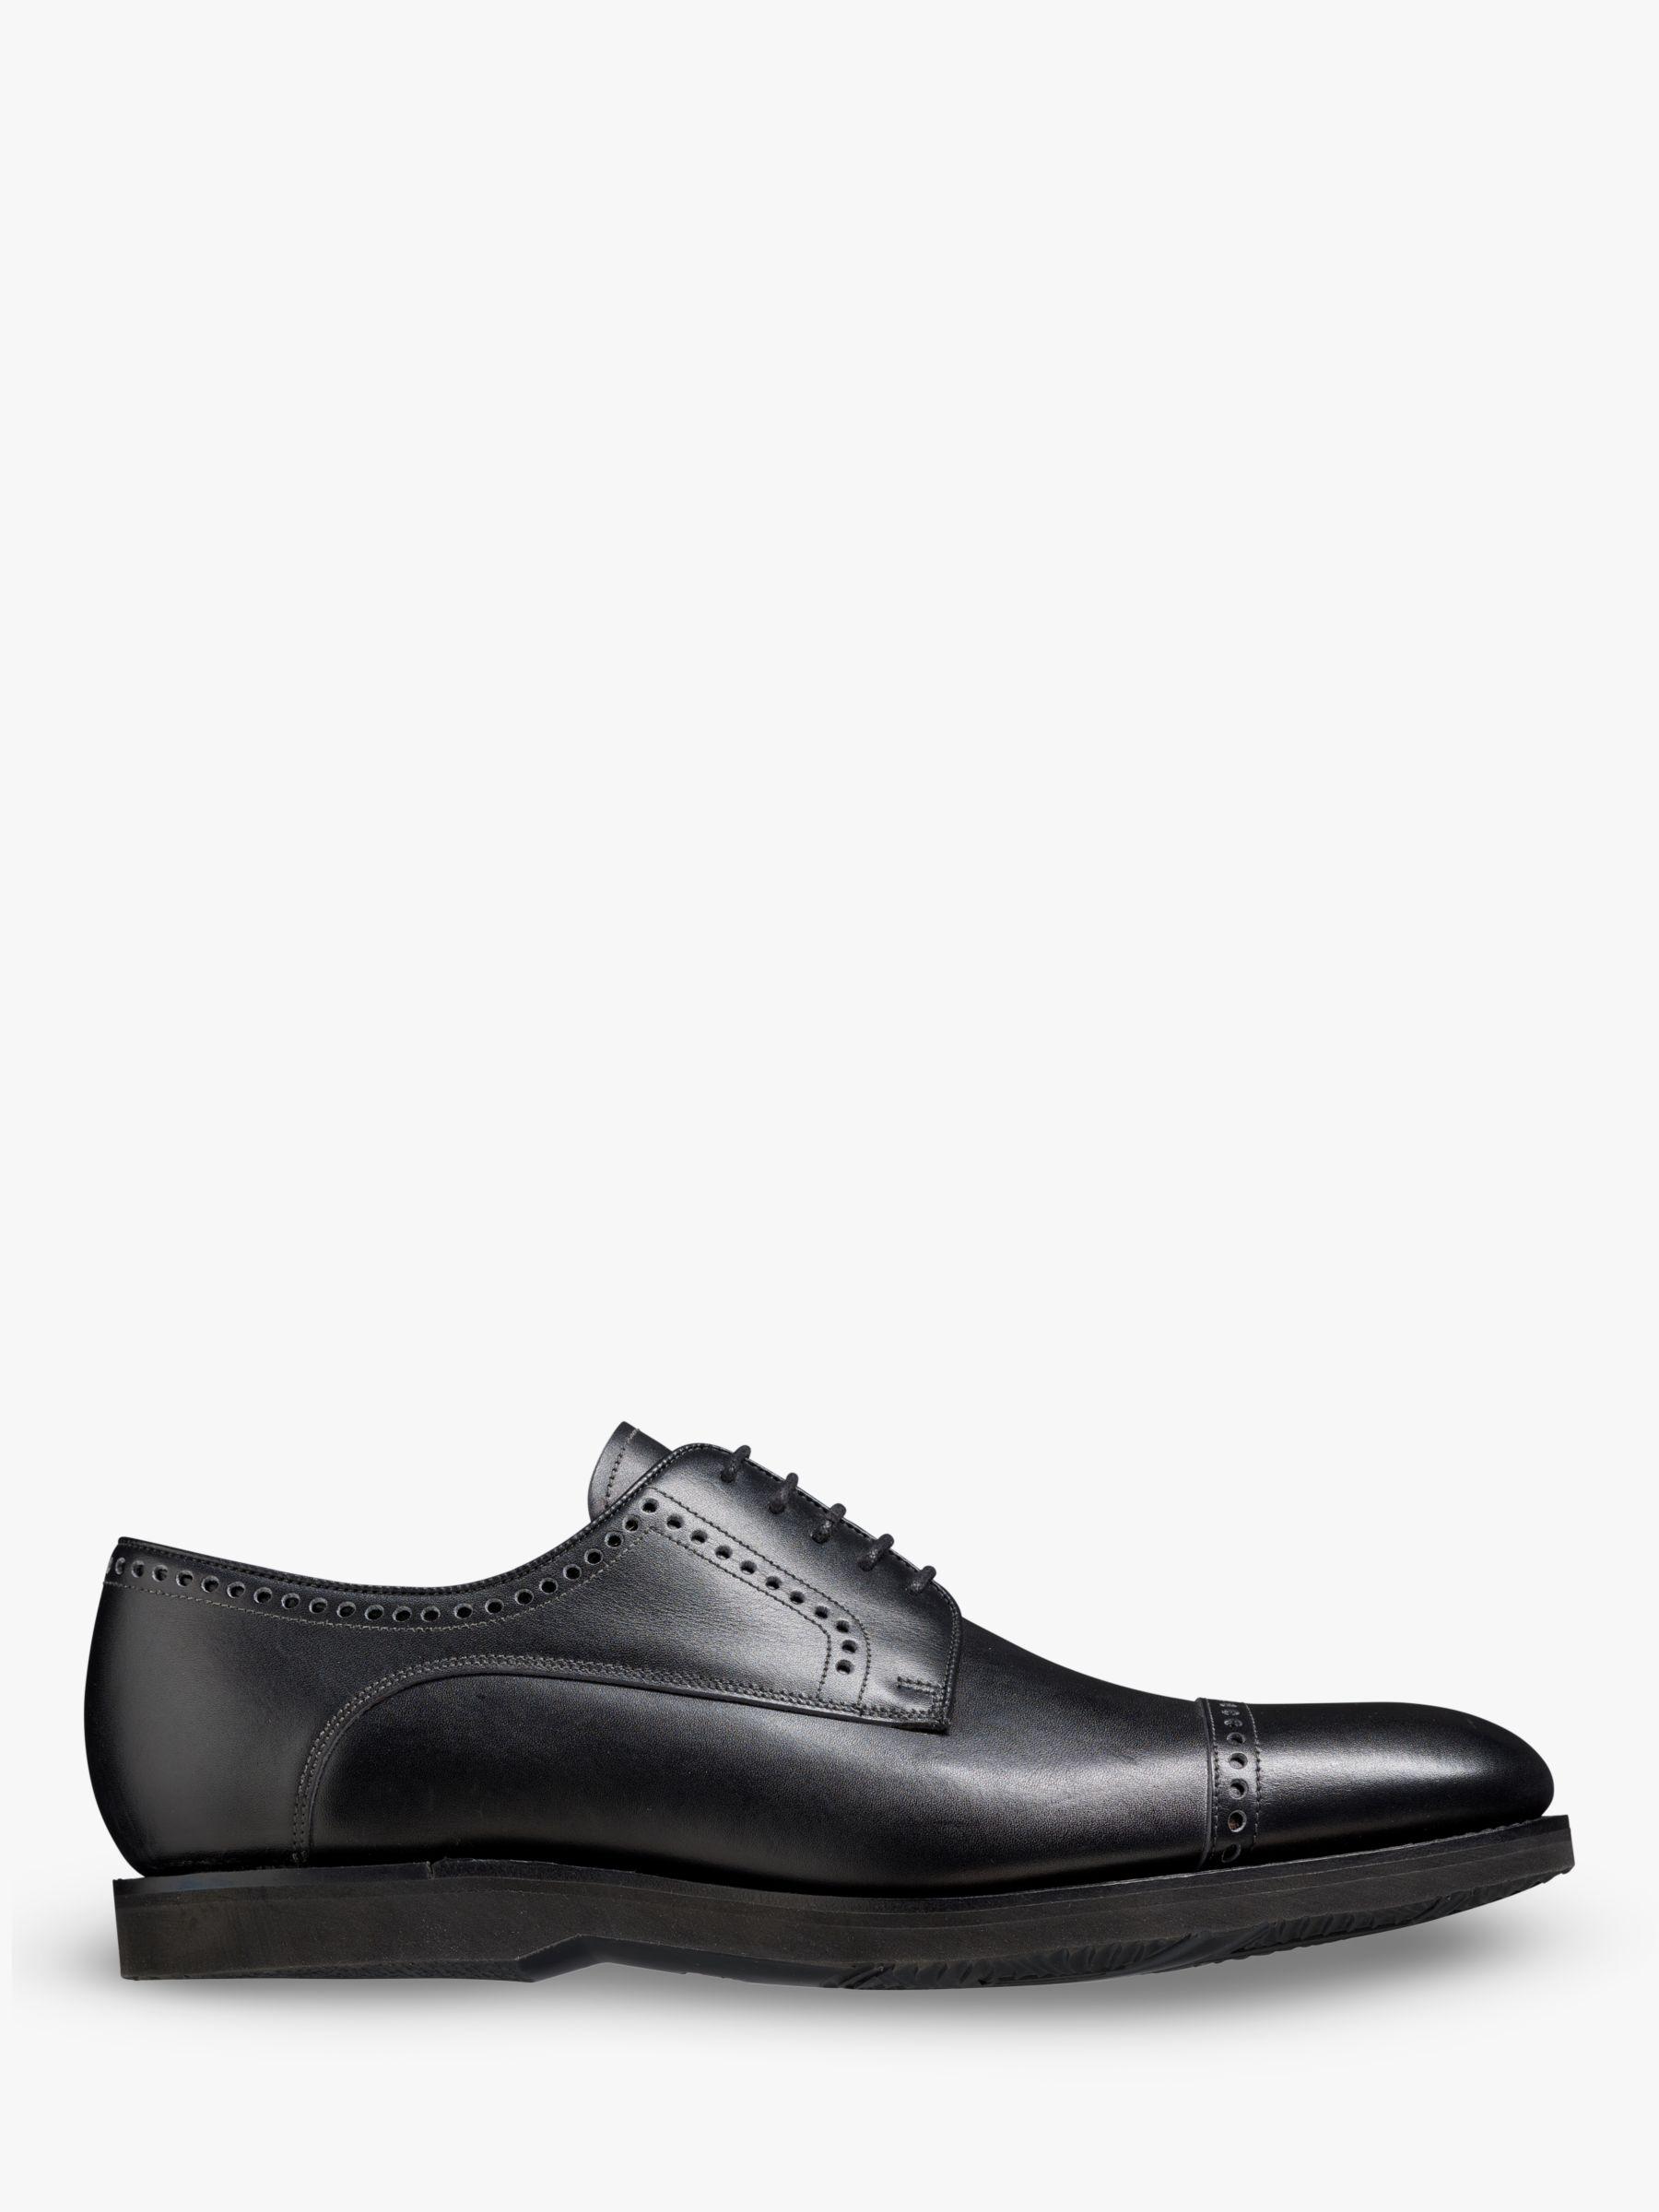 Barker Barker Marcus Leather Derby Shoes, Black Carf